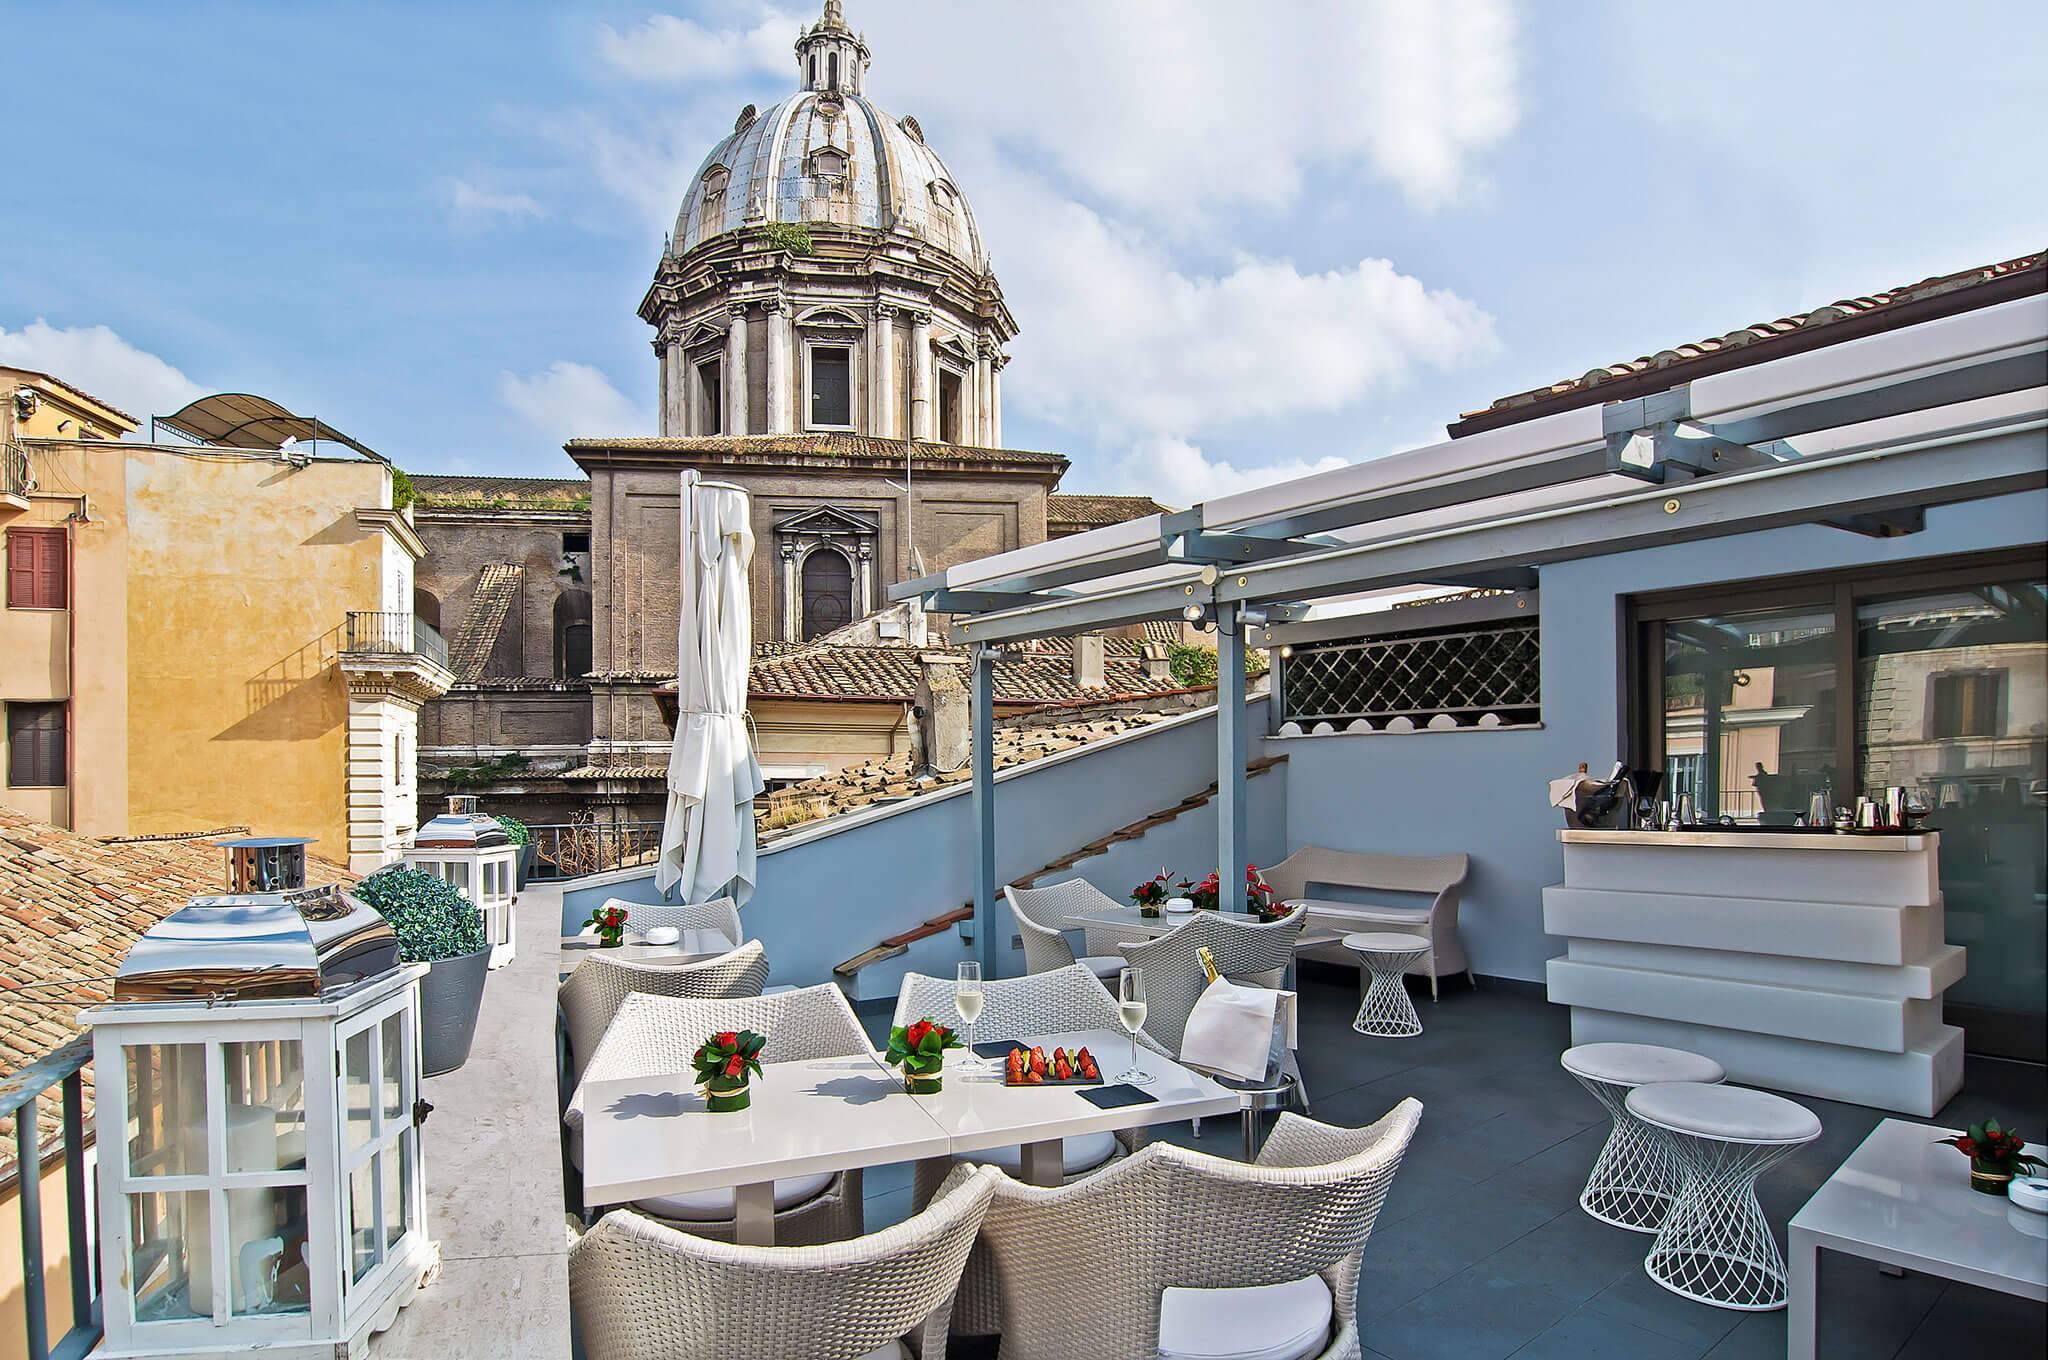 hotel-lunetta-rome-garden-02.jpg